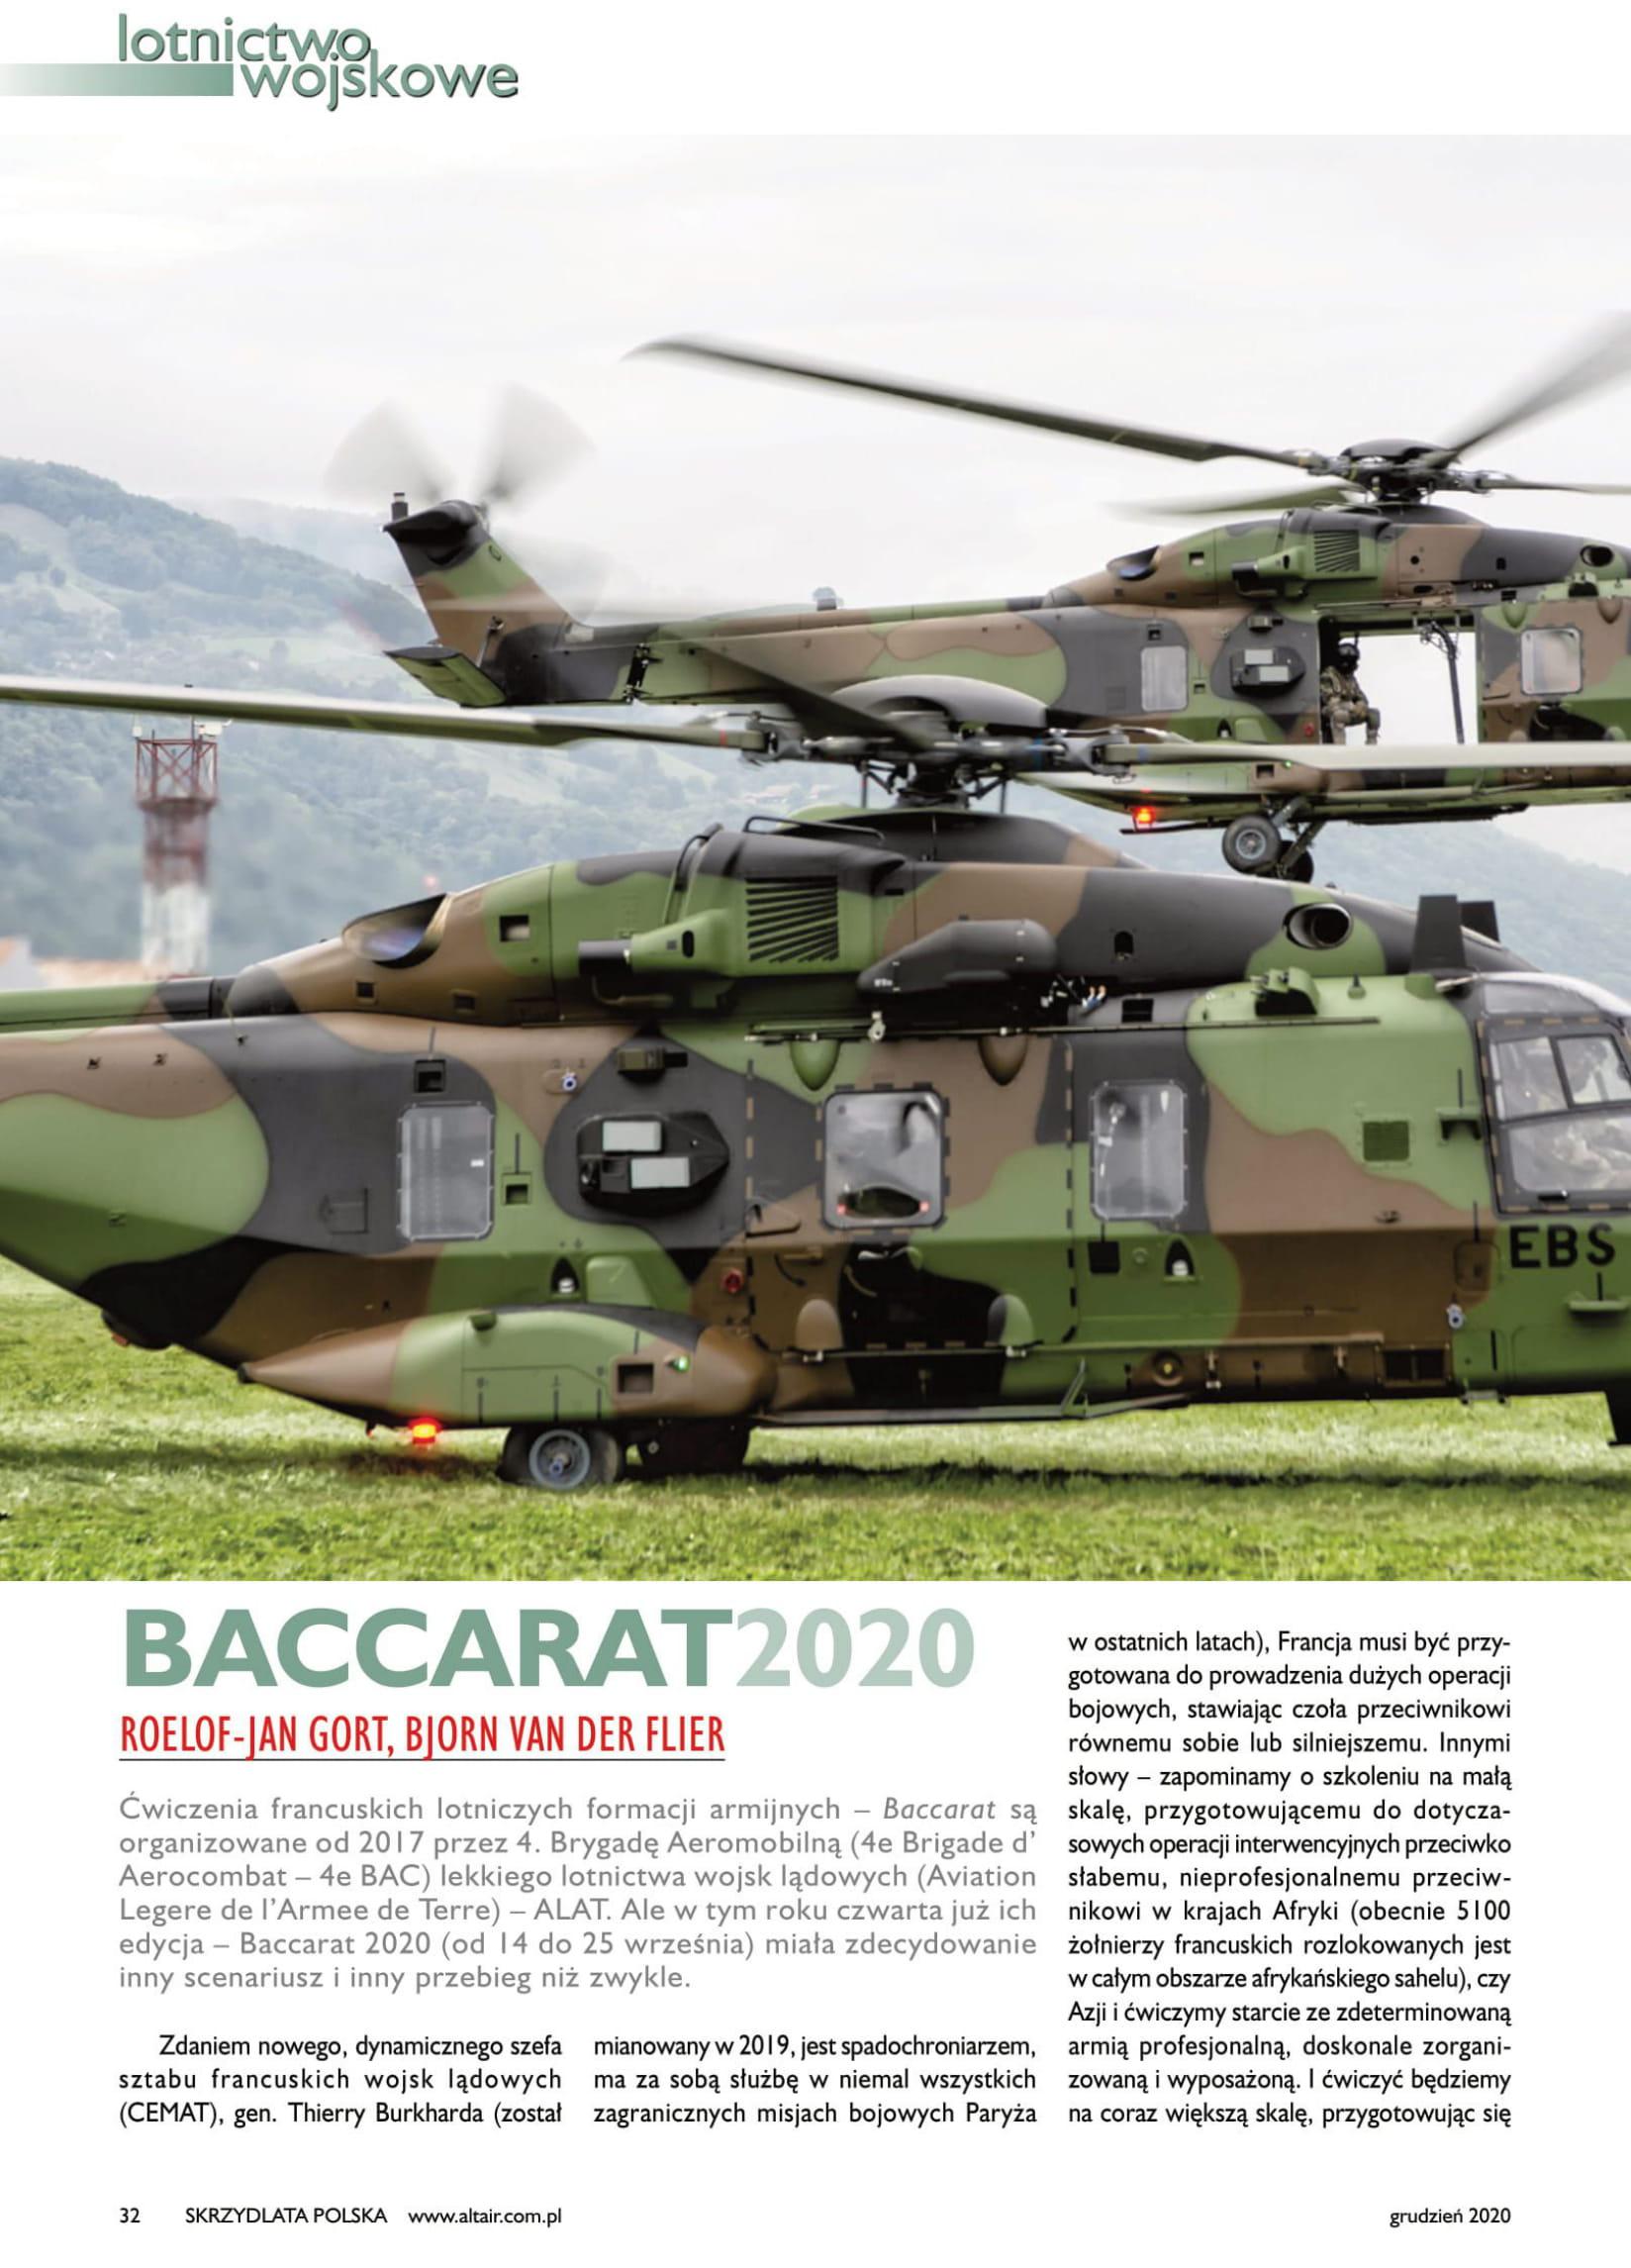 Skrzydlata Polska (Poland) - Baccarat 2020 (December 2020)-2